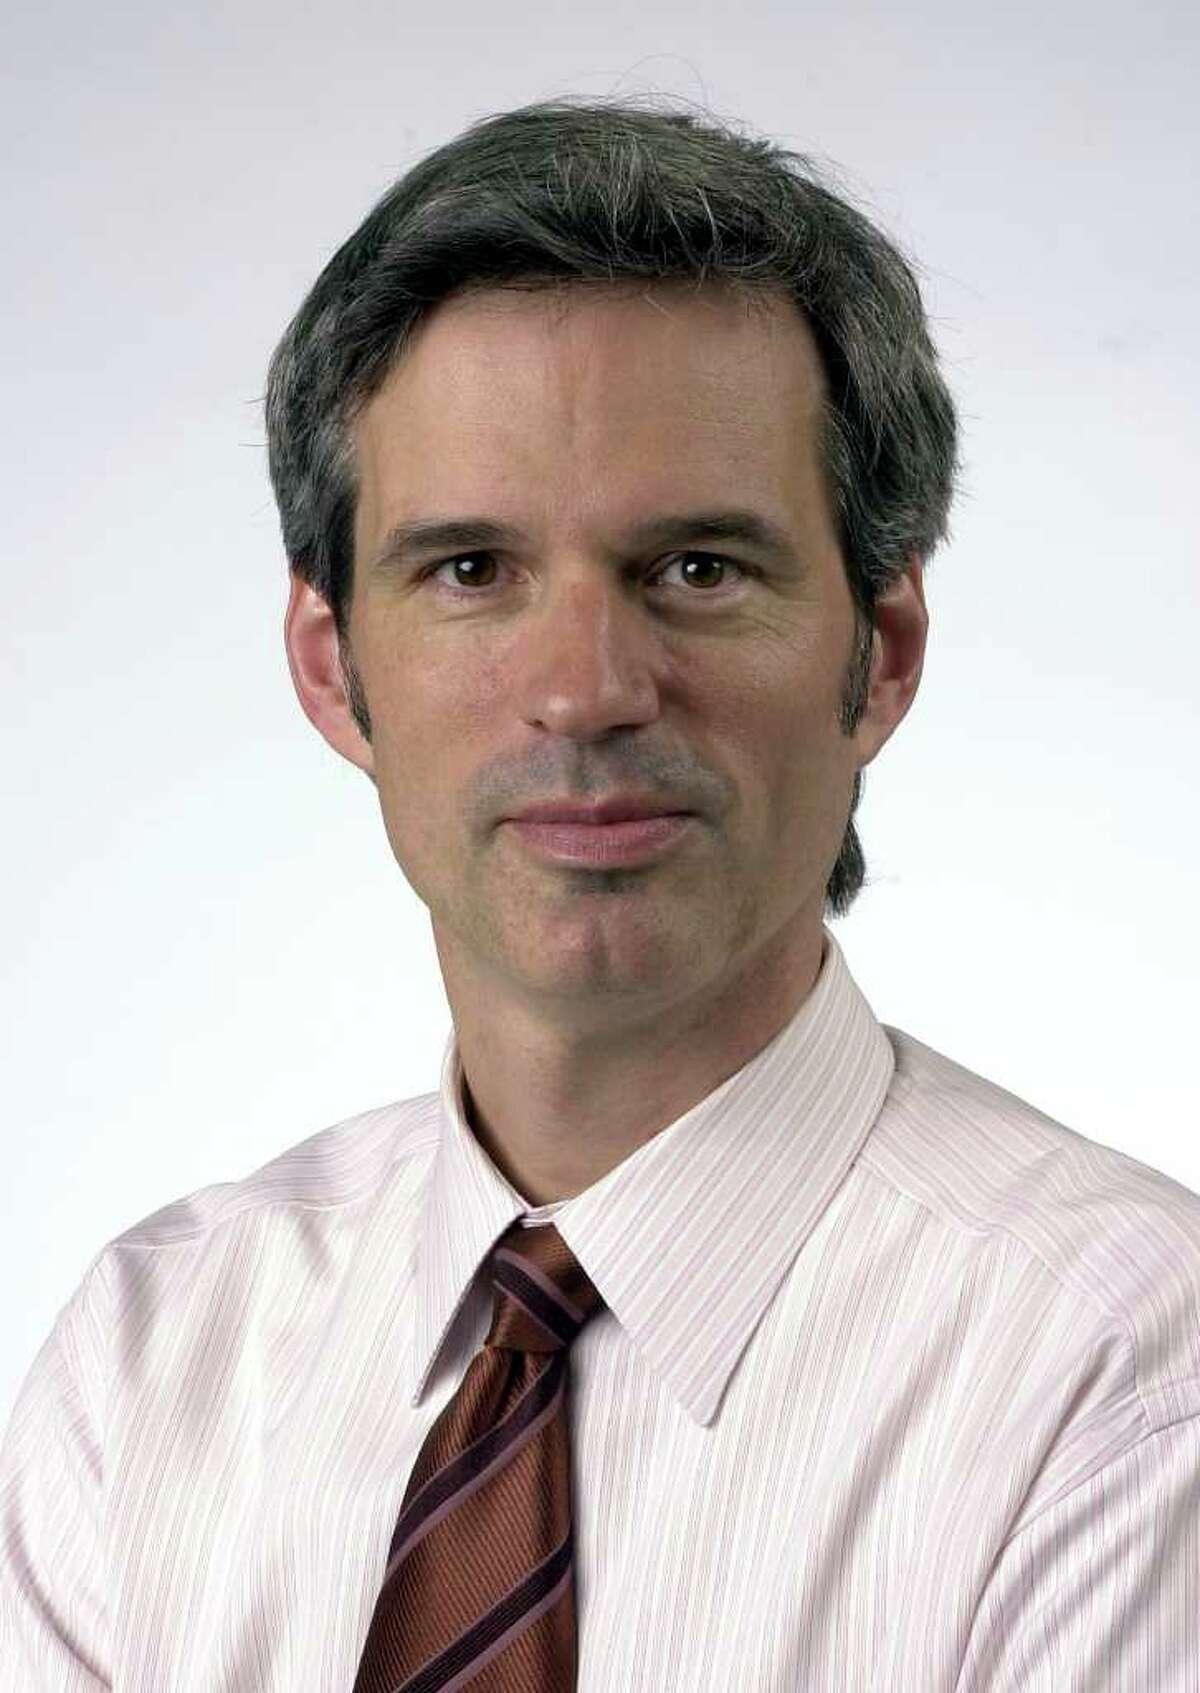 Brett Thacker: He was named E-N's managing editor in August 2003.